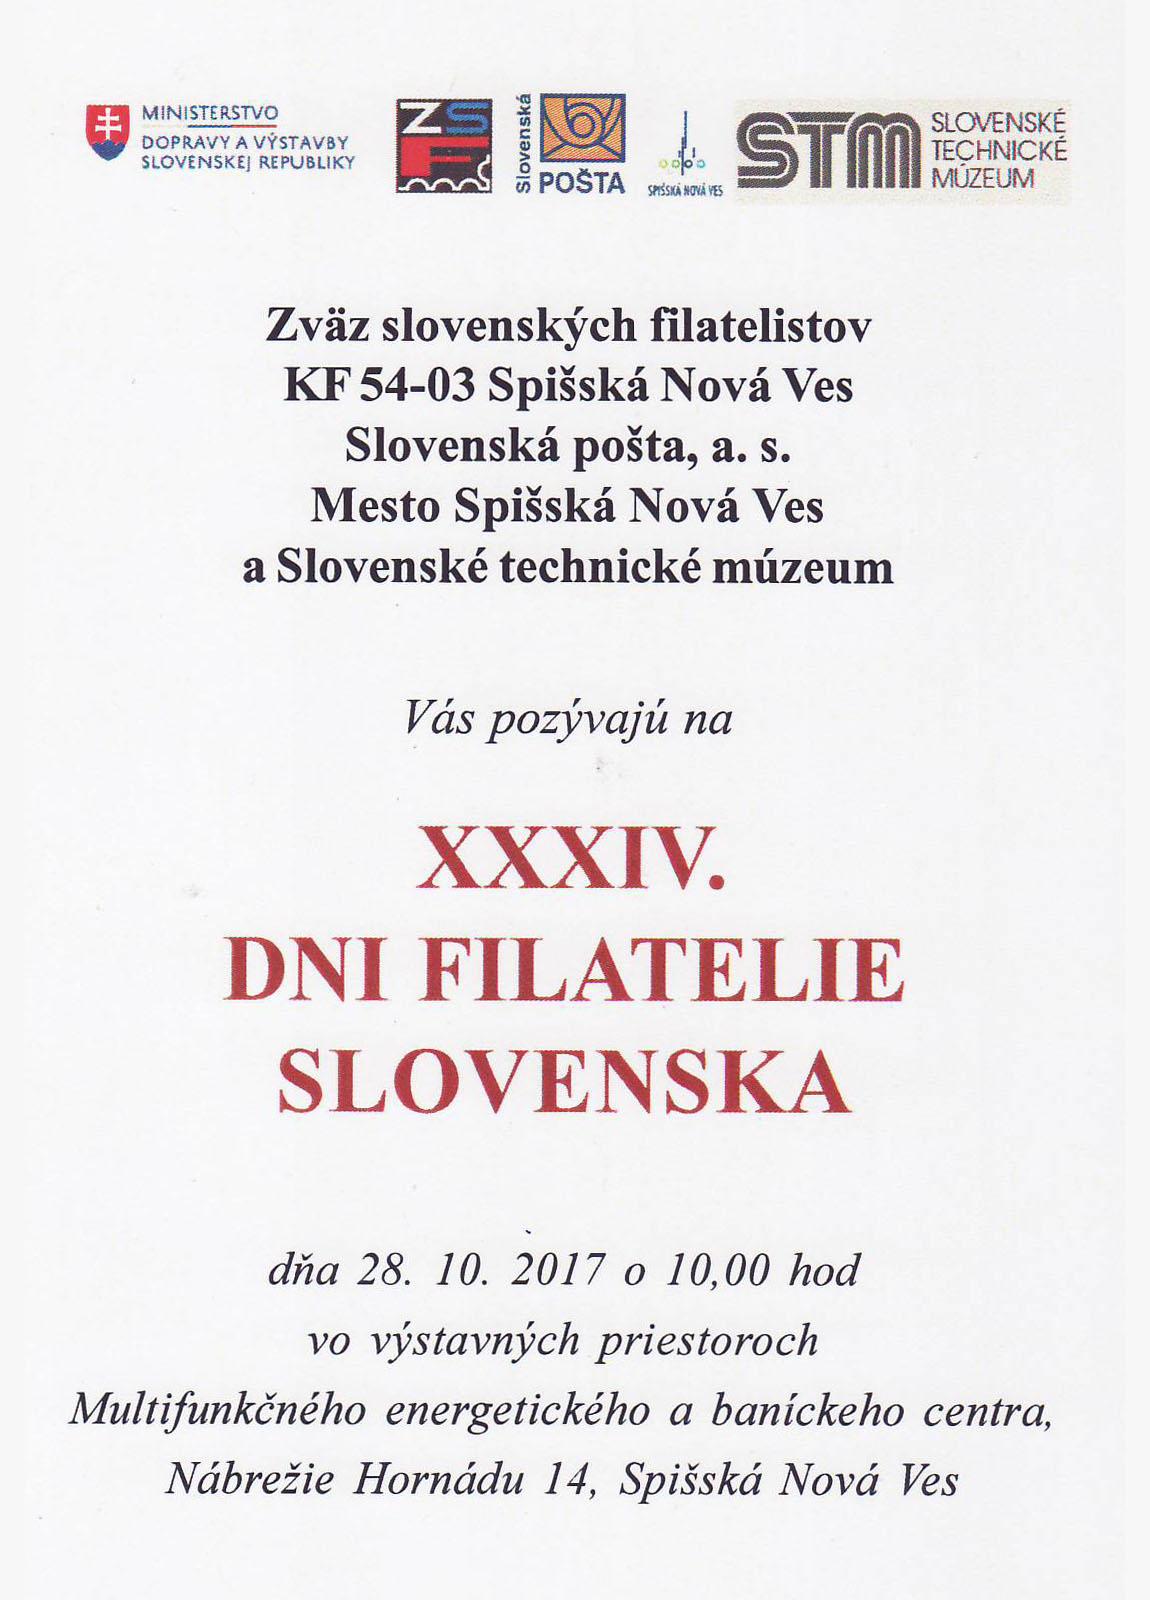 XXXIV. Dni filatelie Slovenska 2017 v Spišskej Novej Vsi